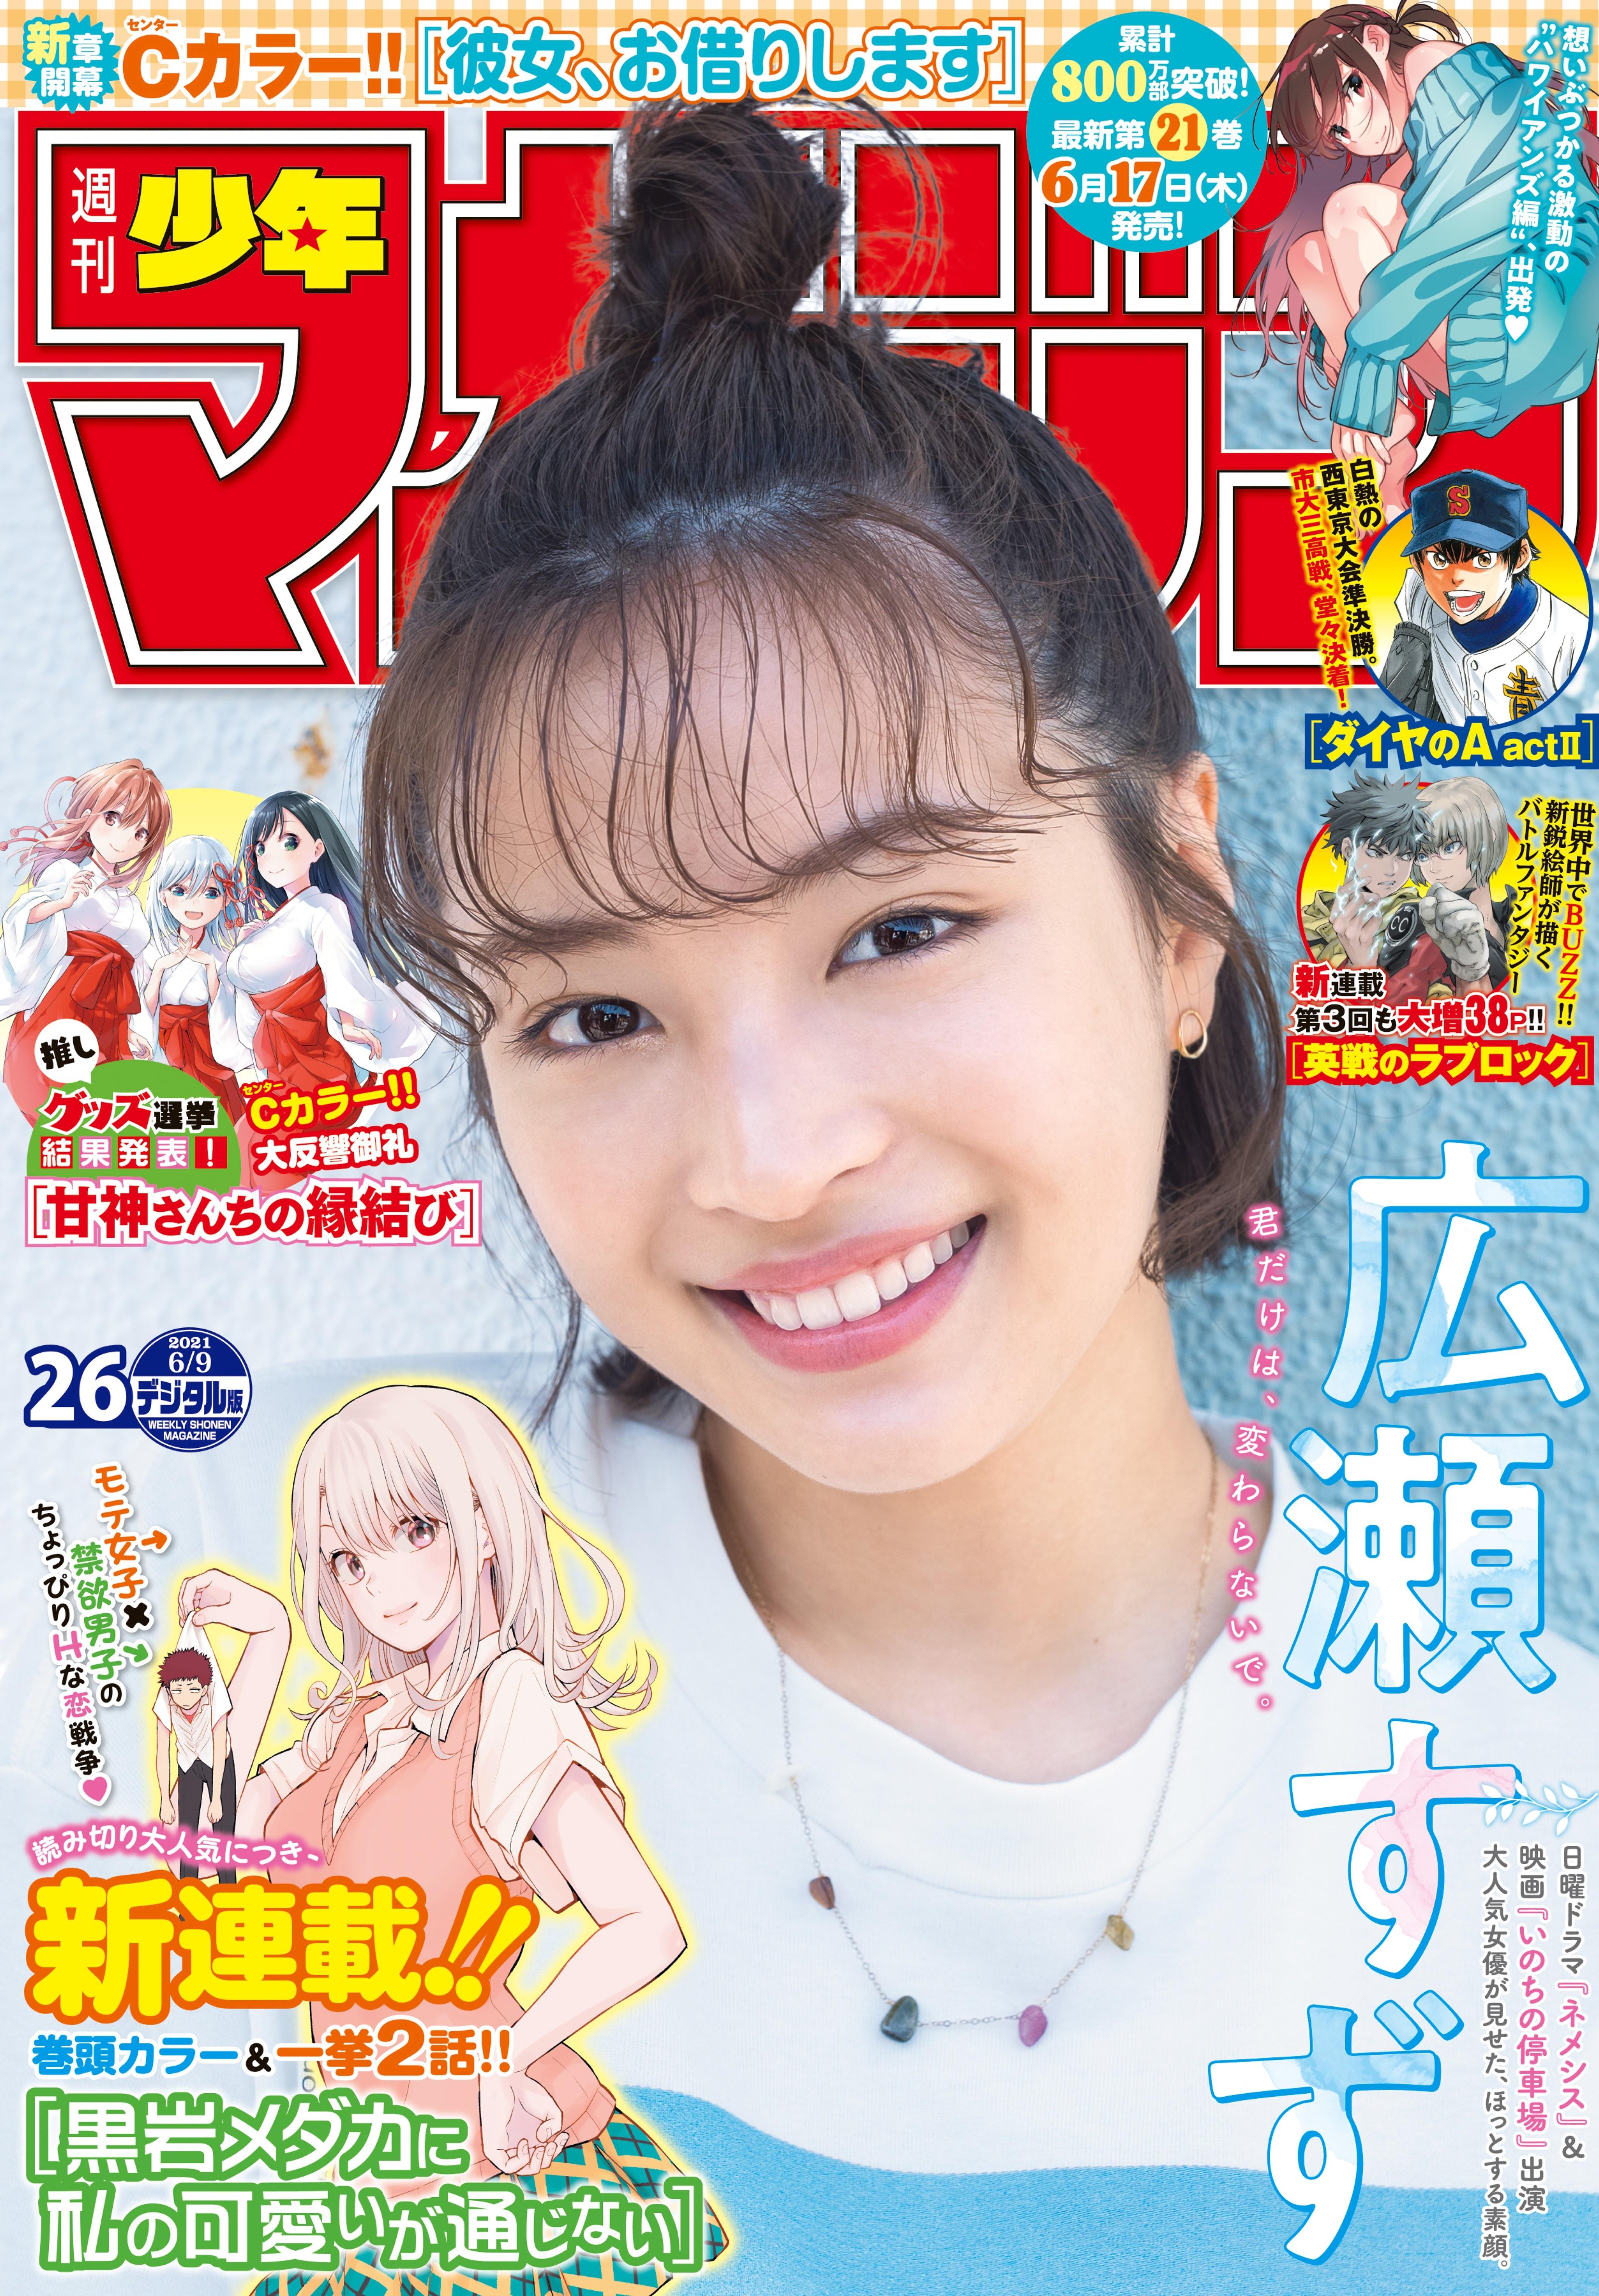 少年Magazine 广濑丝丝 广濑